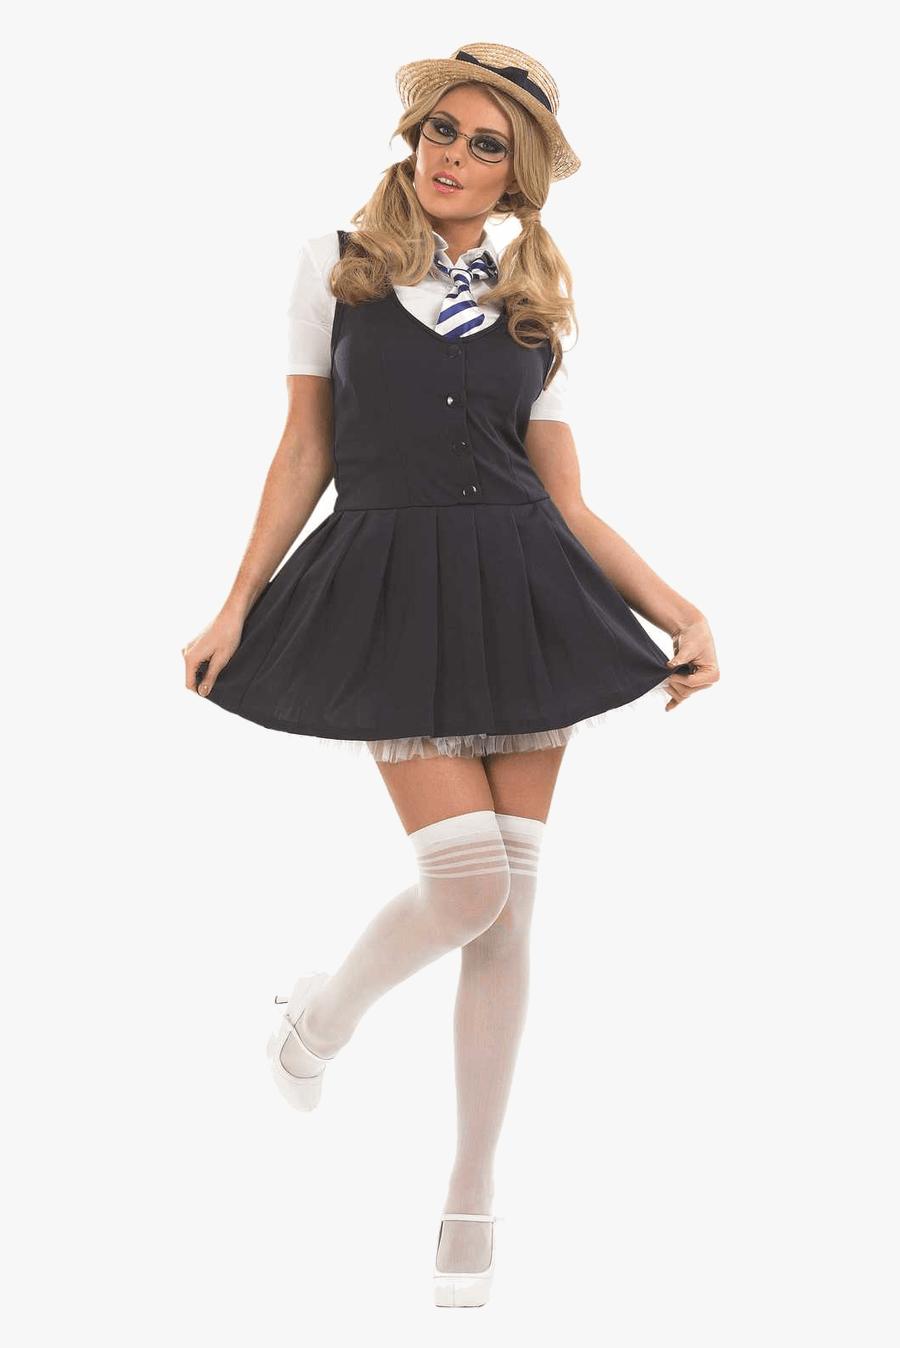 Clip Art Girl Disco Outfits - St Trinians School Girl Uniform, Transparent Clipart